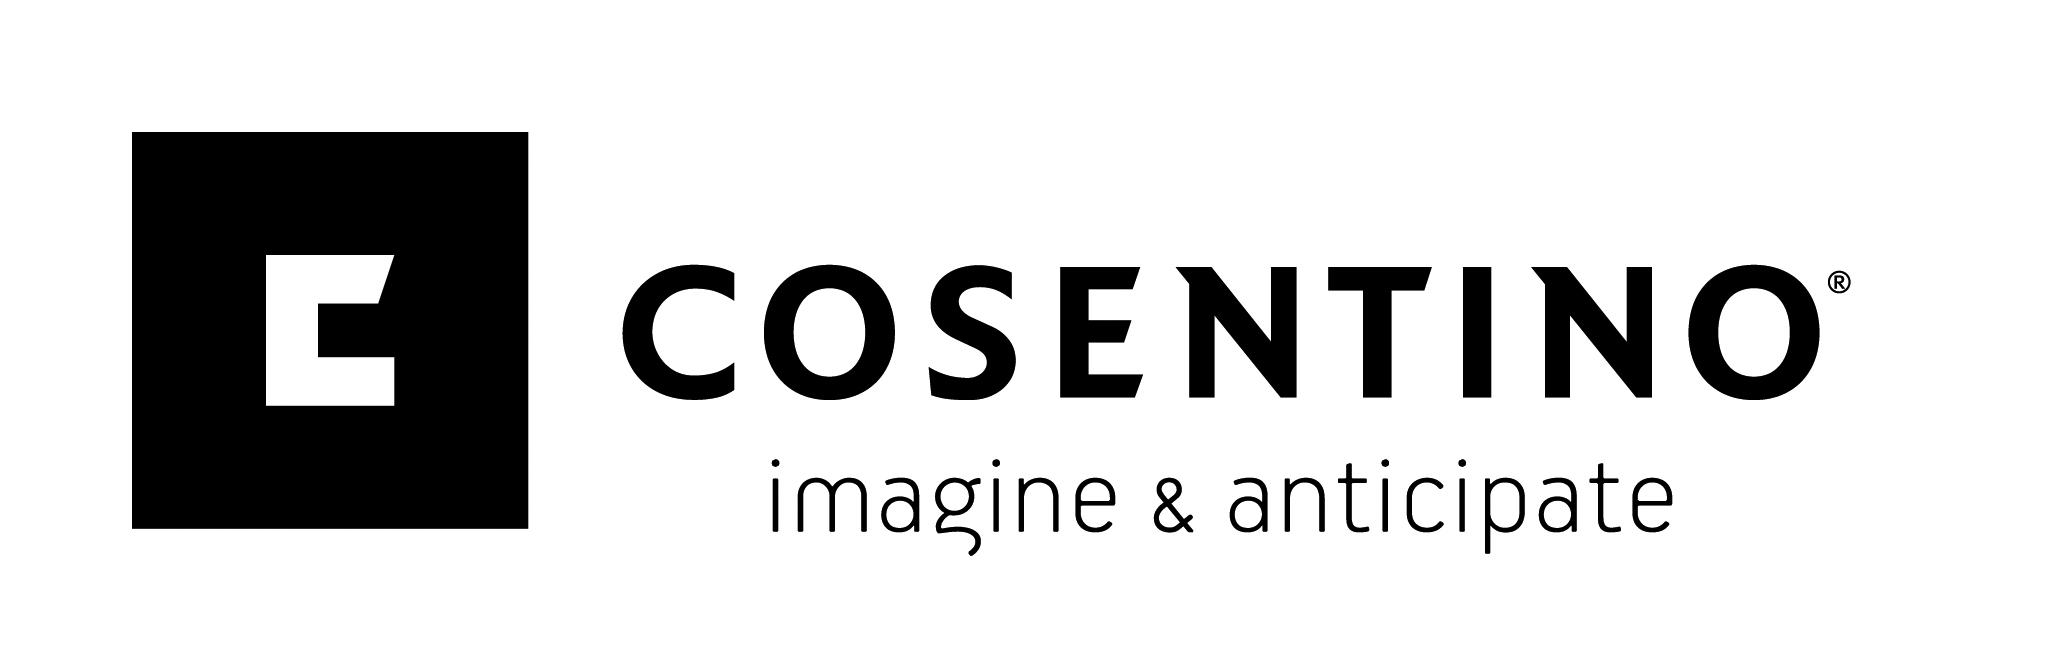 Cosentino-Horizontal.png